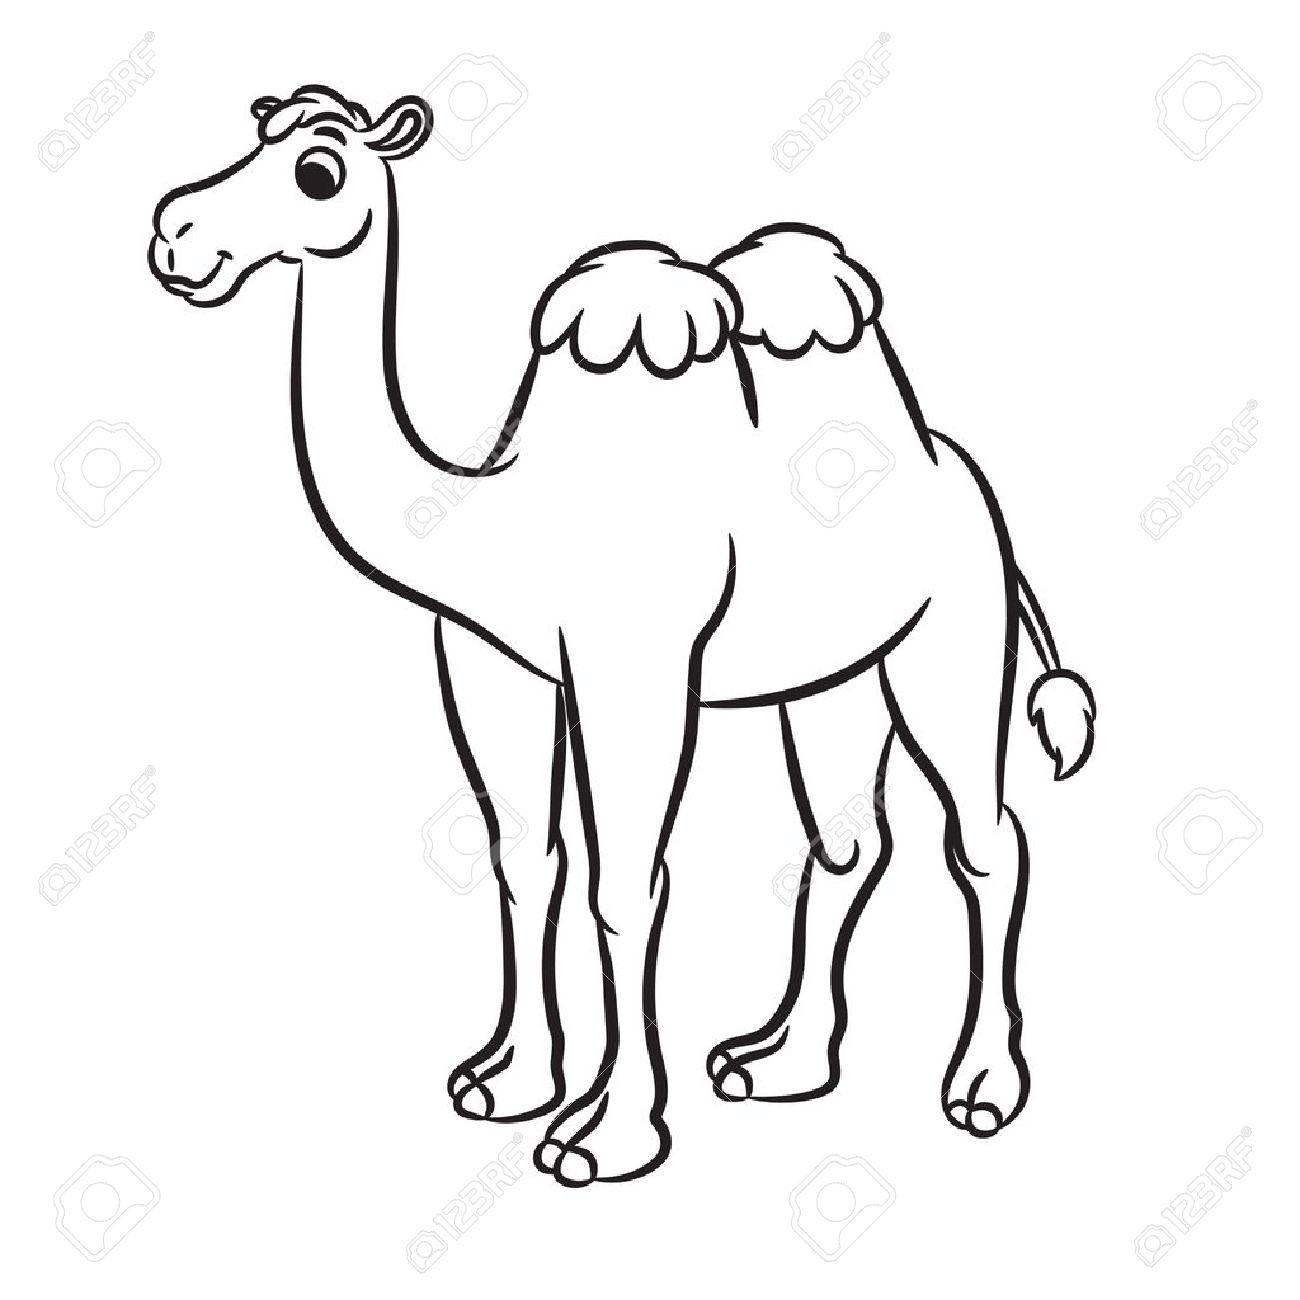 1300x1300 Cartoon Illustration Of Cute Camel Outlined. Vector Illustration